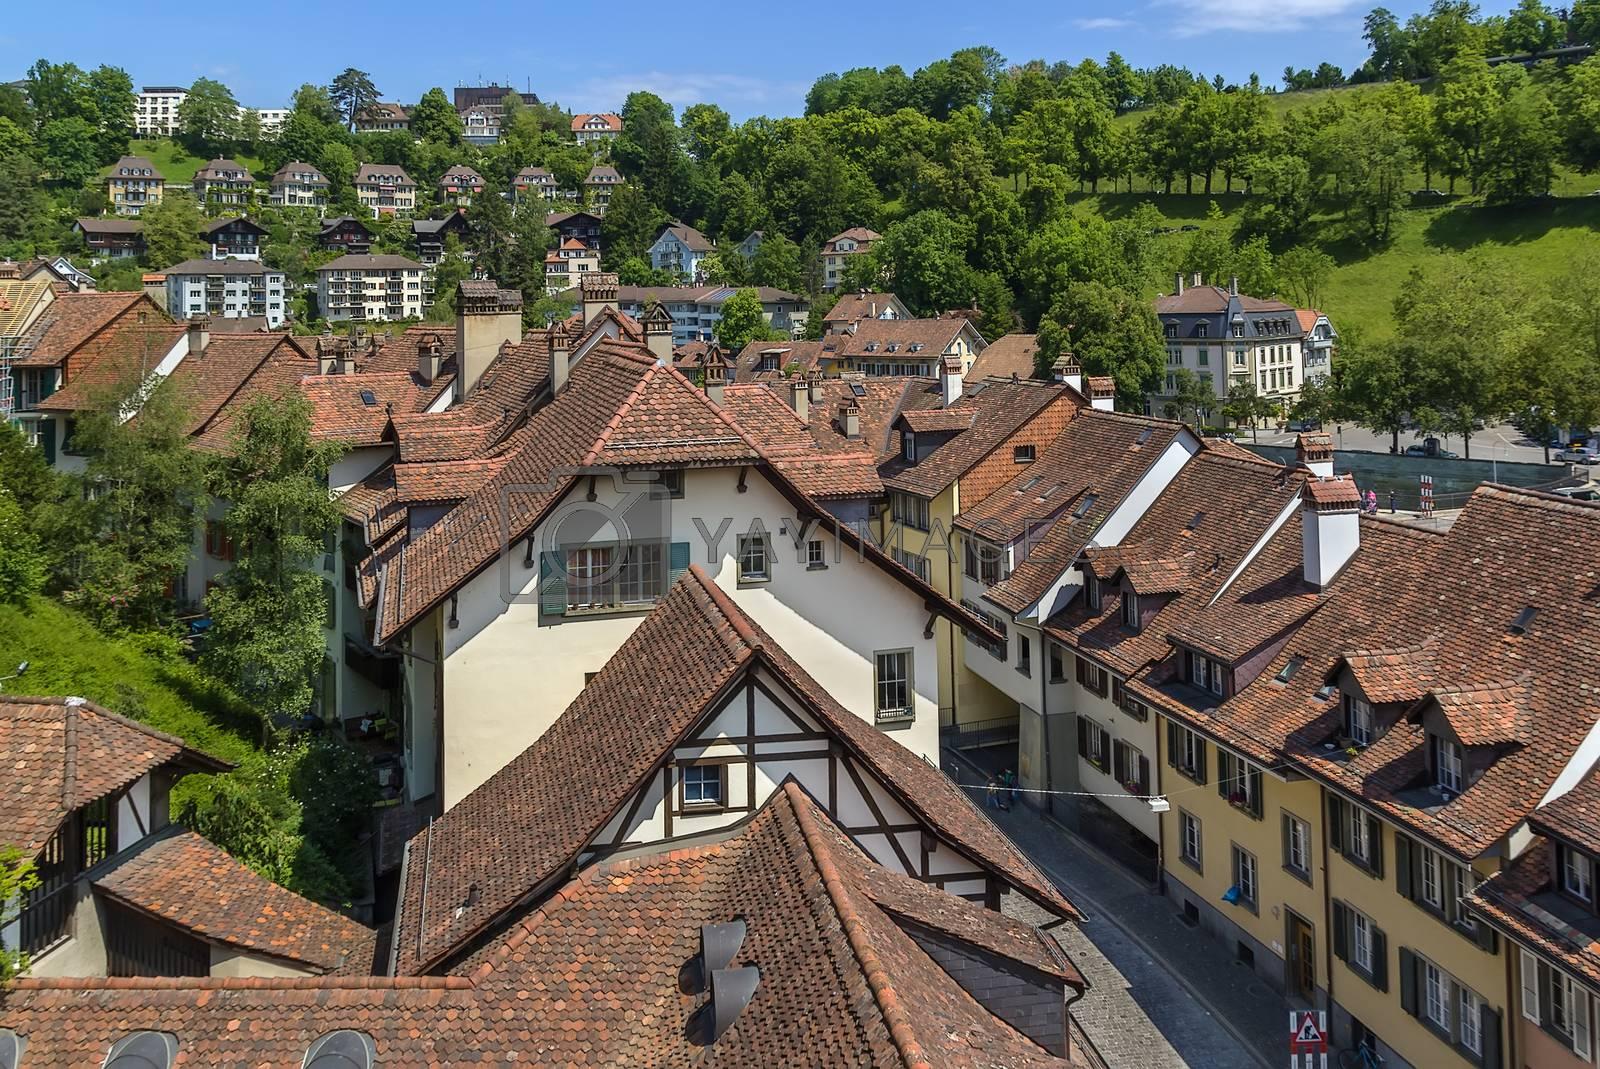 Bern by borisb17